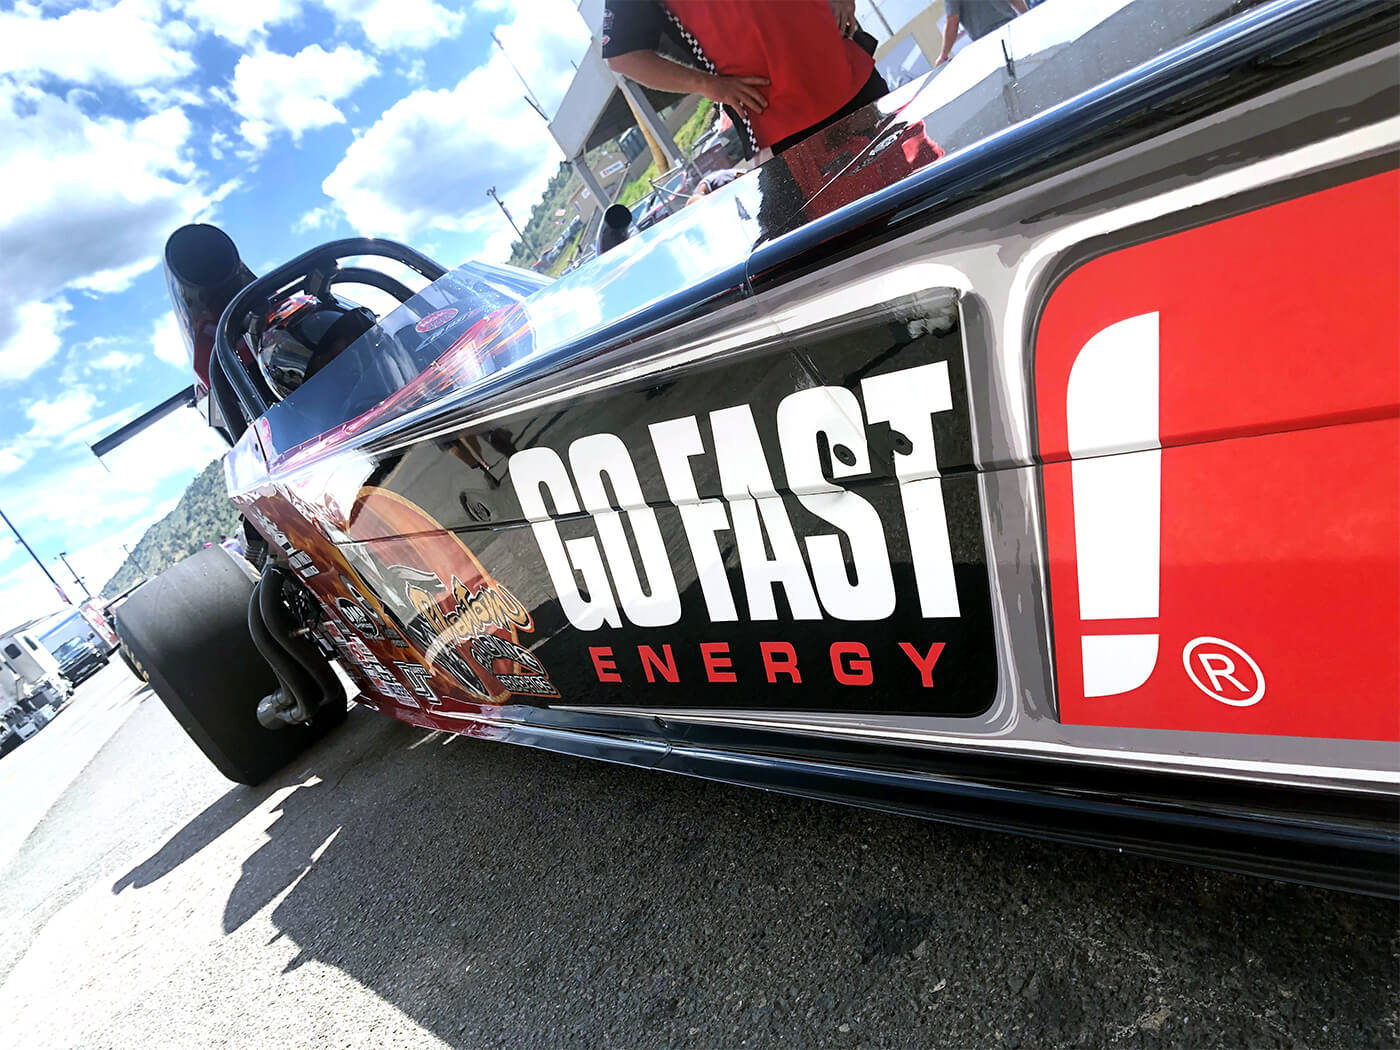 Team GoFast! race car side decal